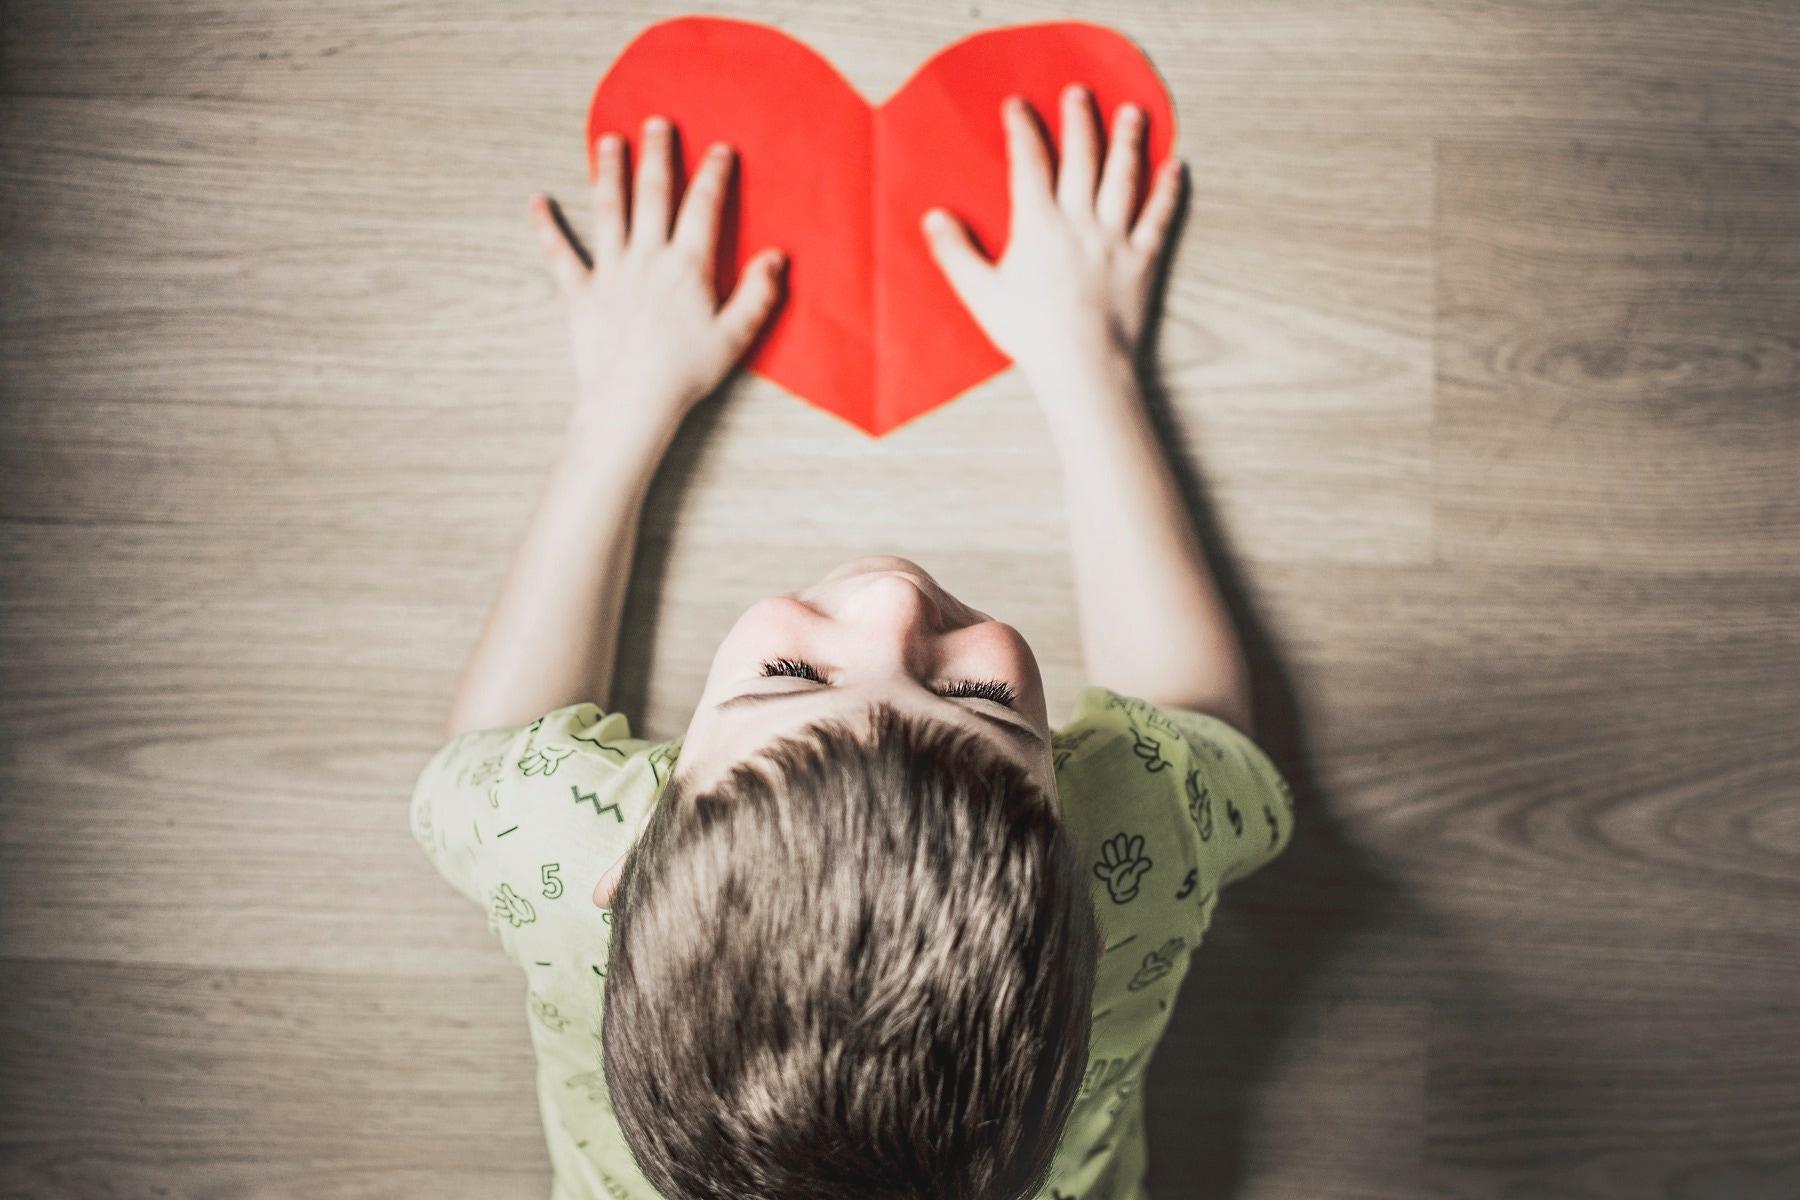 boy holding craft red heart kid toddler